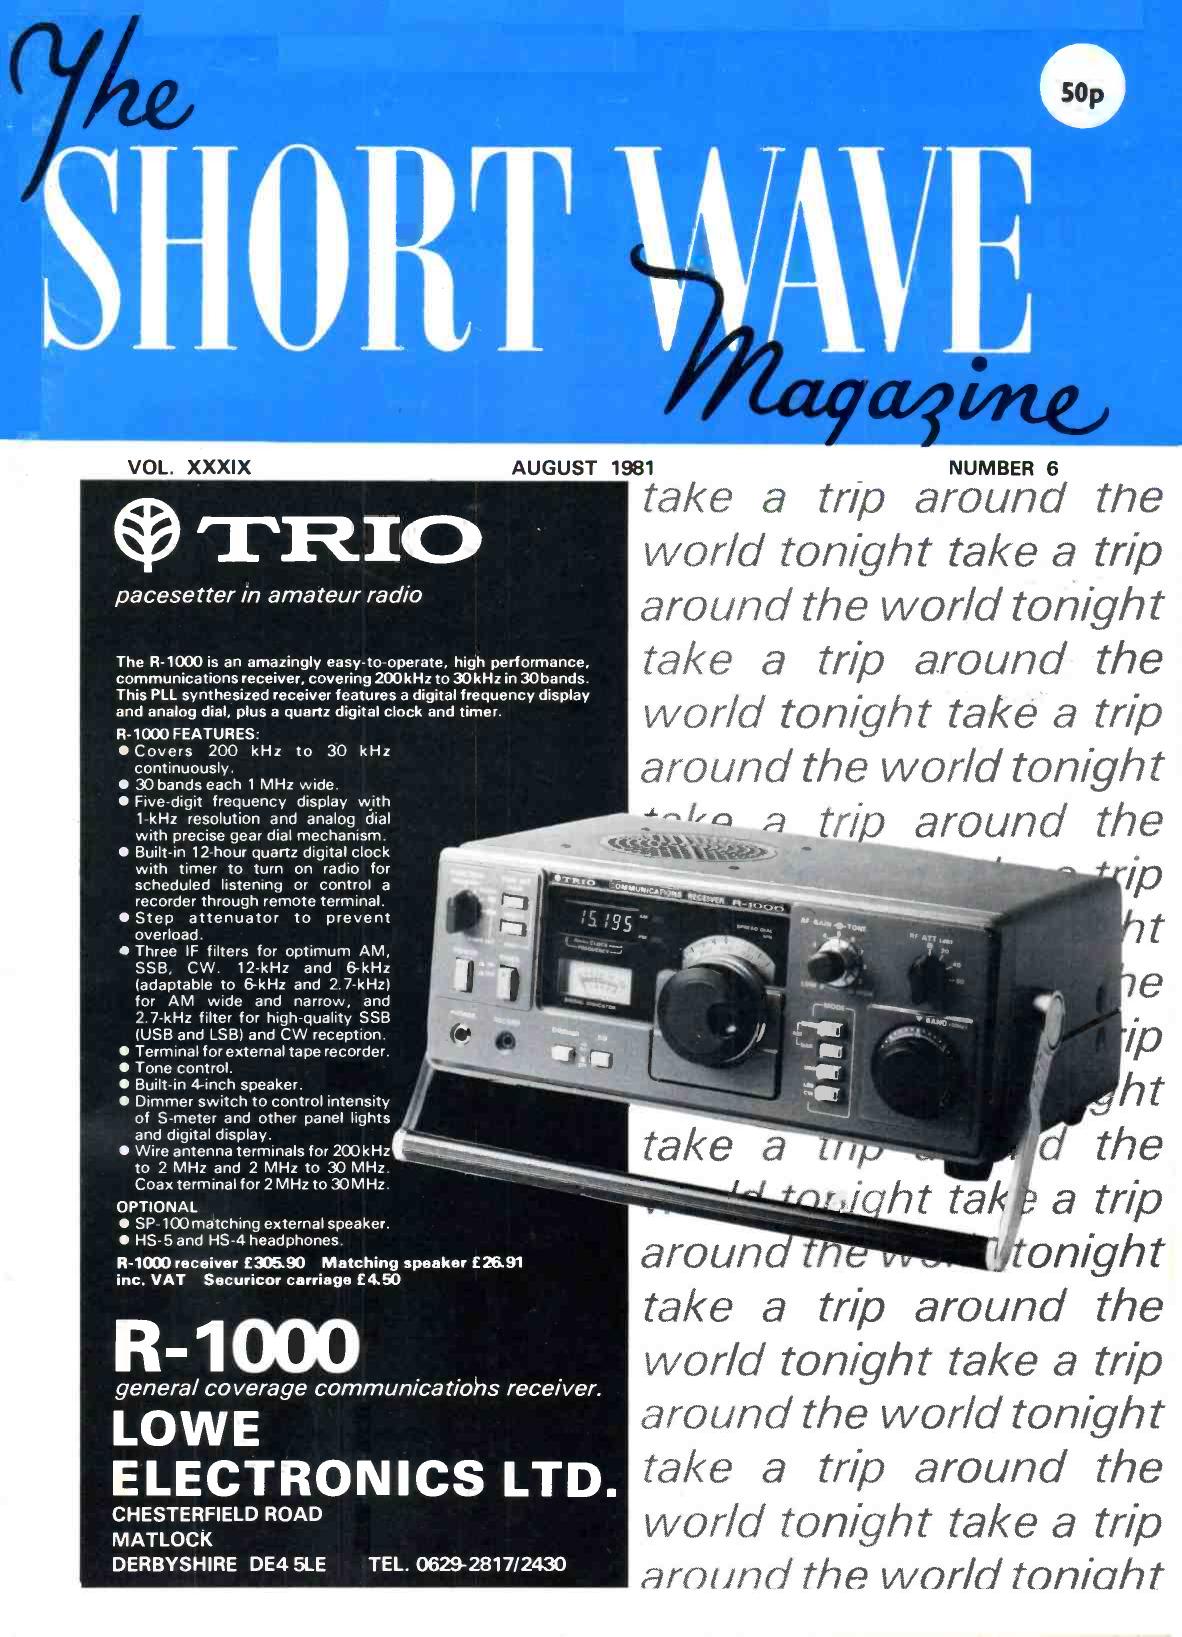 1Set M-150 VHF 136-174MHz Antenna PL259 Fr Car Radio Yaesu ICOM Kenwood Blak T2